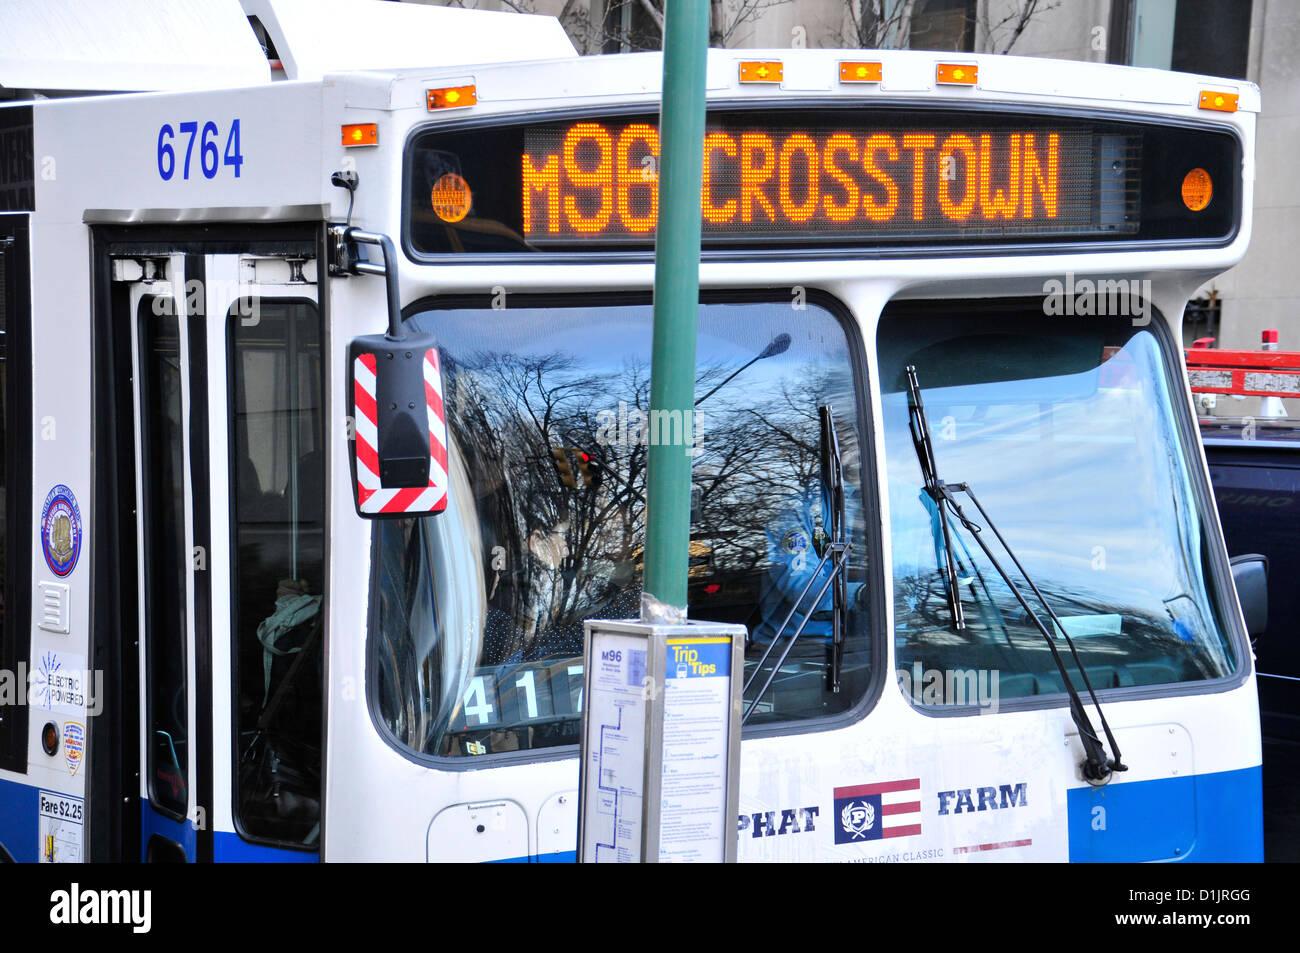 New York City Public Transportation M96 Crosstown MTA Bus on 5 th Avenue, Manhattan, New York City, USA - Stock Image